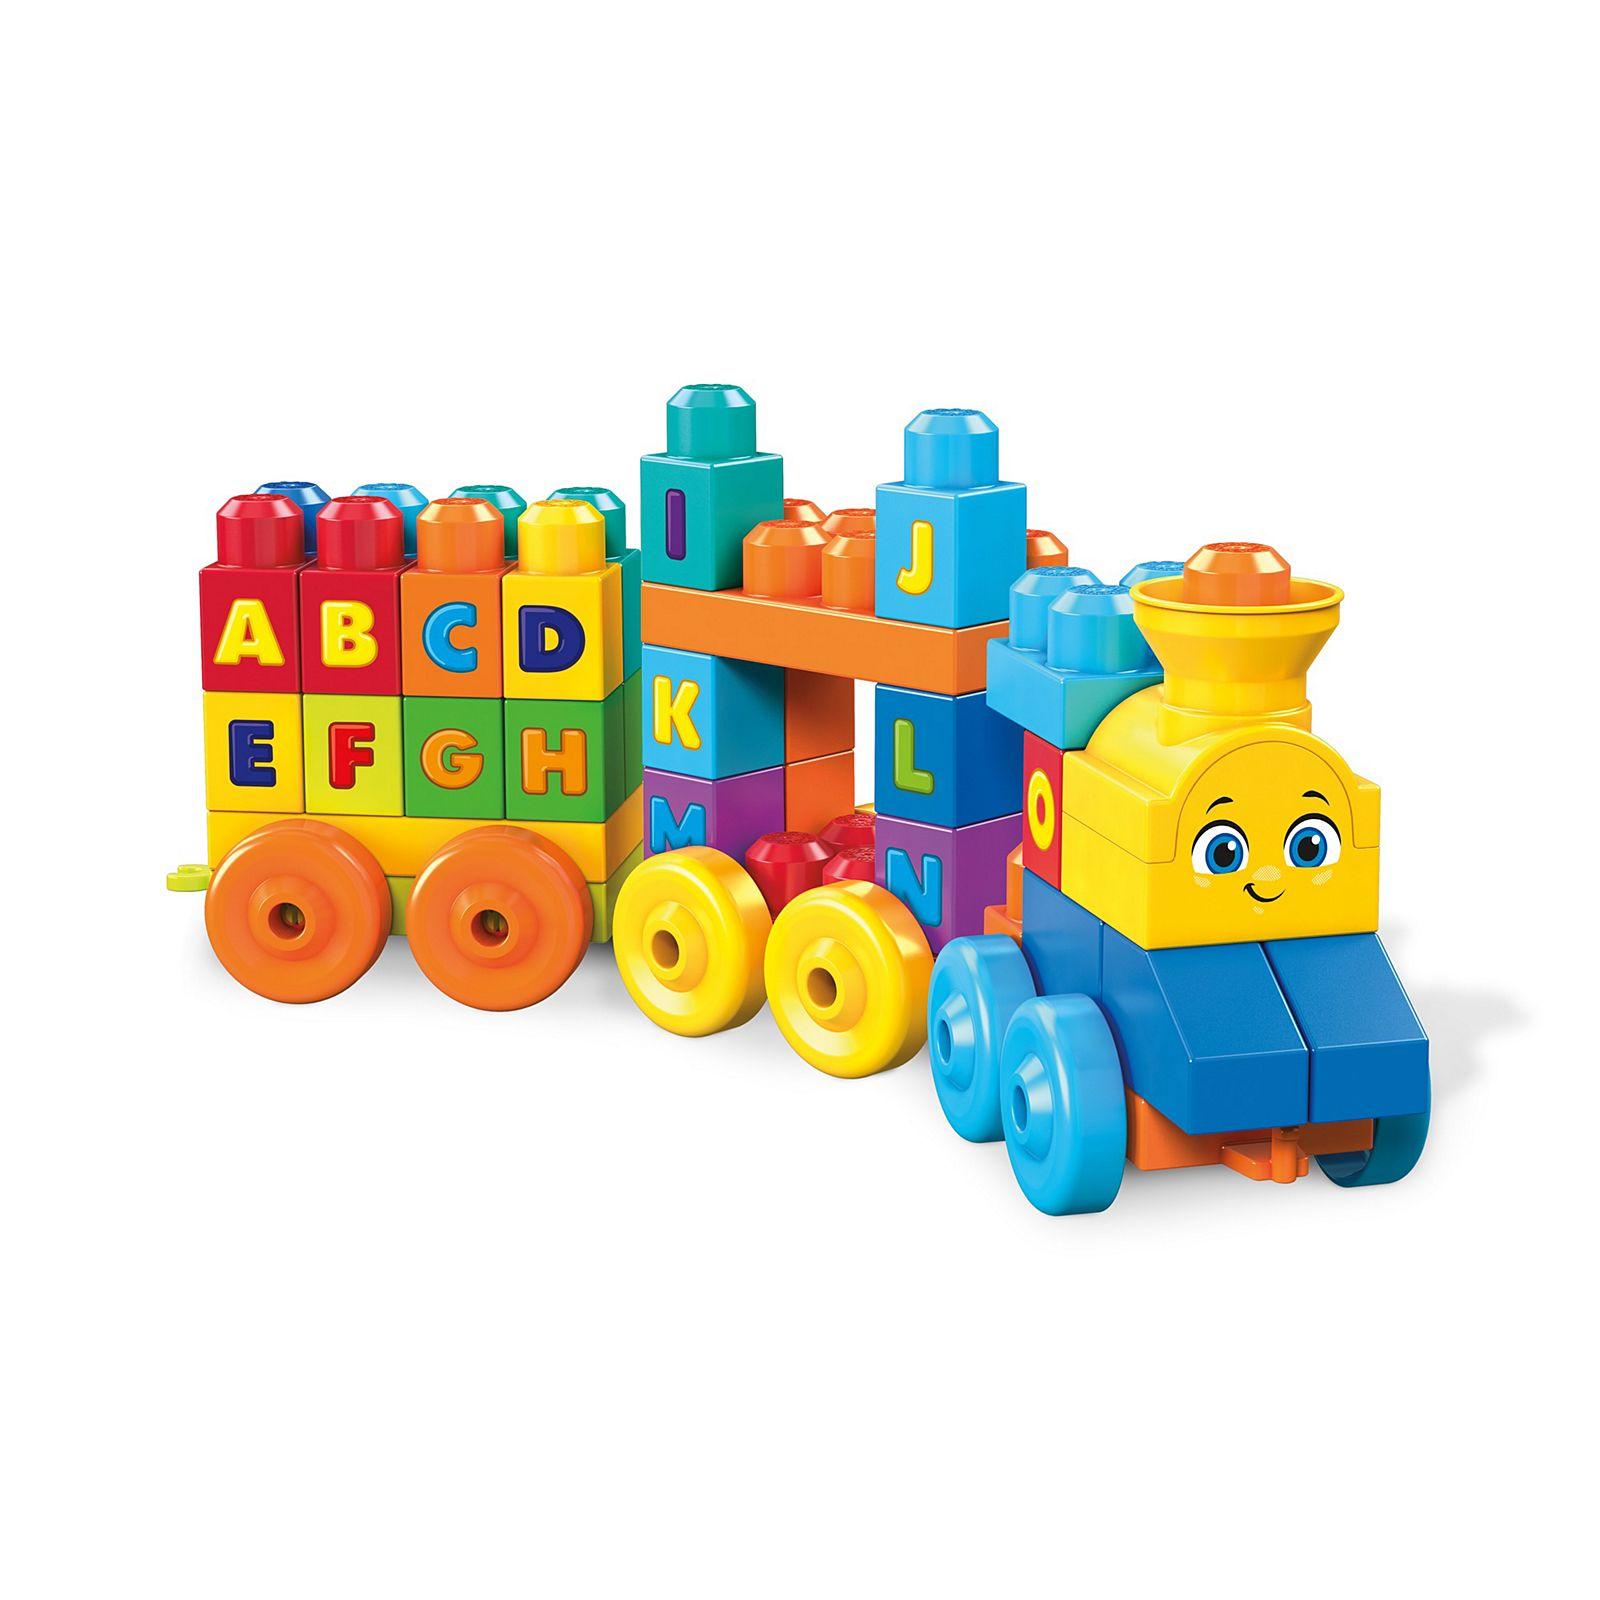 Trenzinho Musical Blocks Alfabeto Divertido FWK22 Fisher-Price